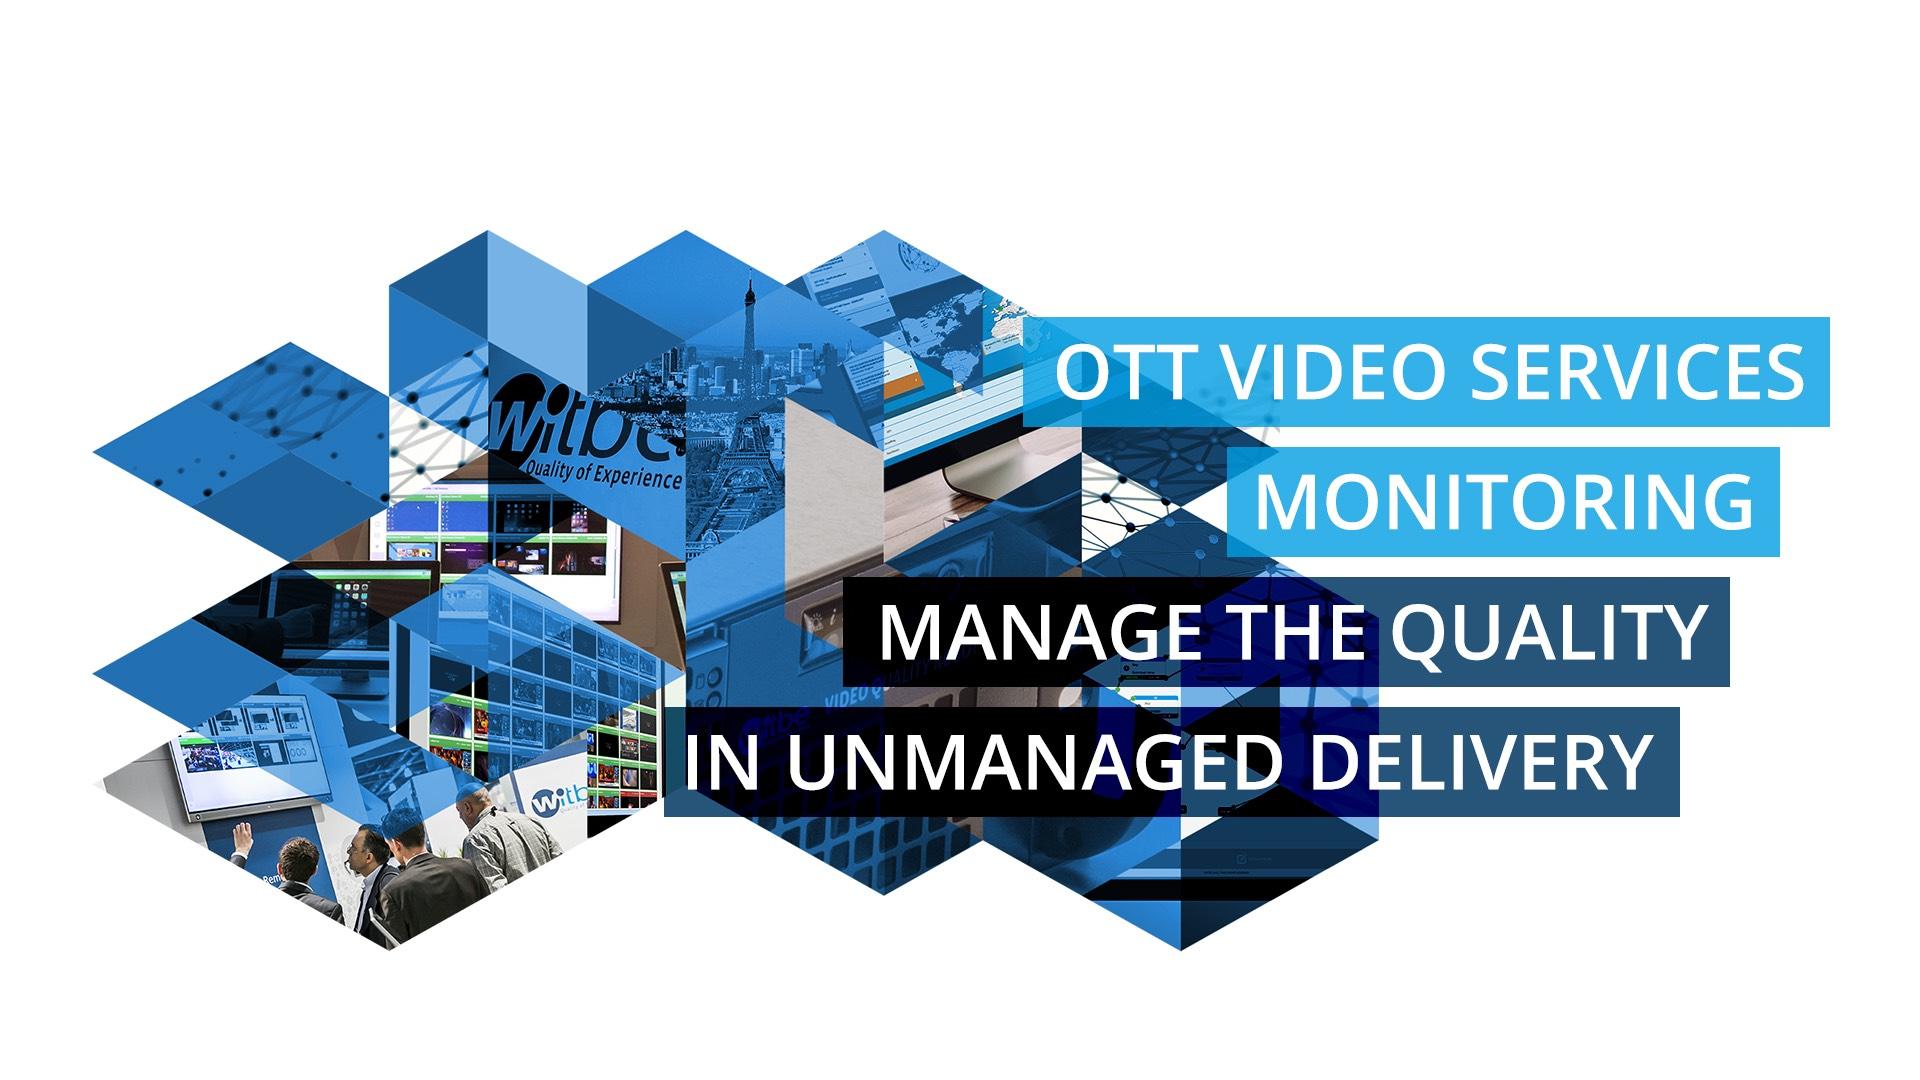 OTT Video monitoring